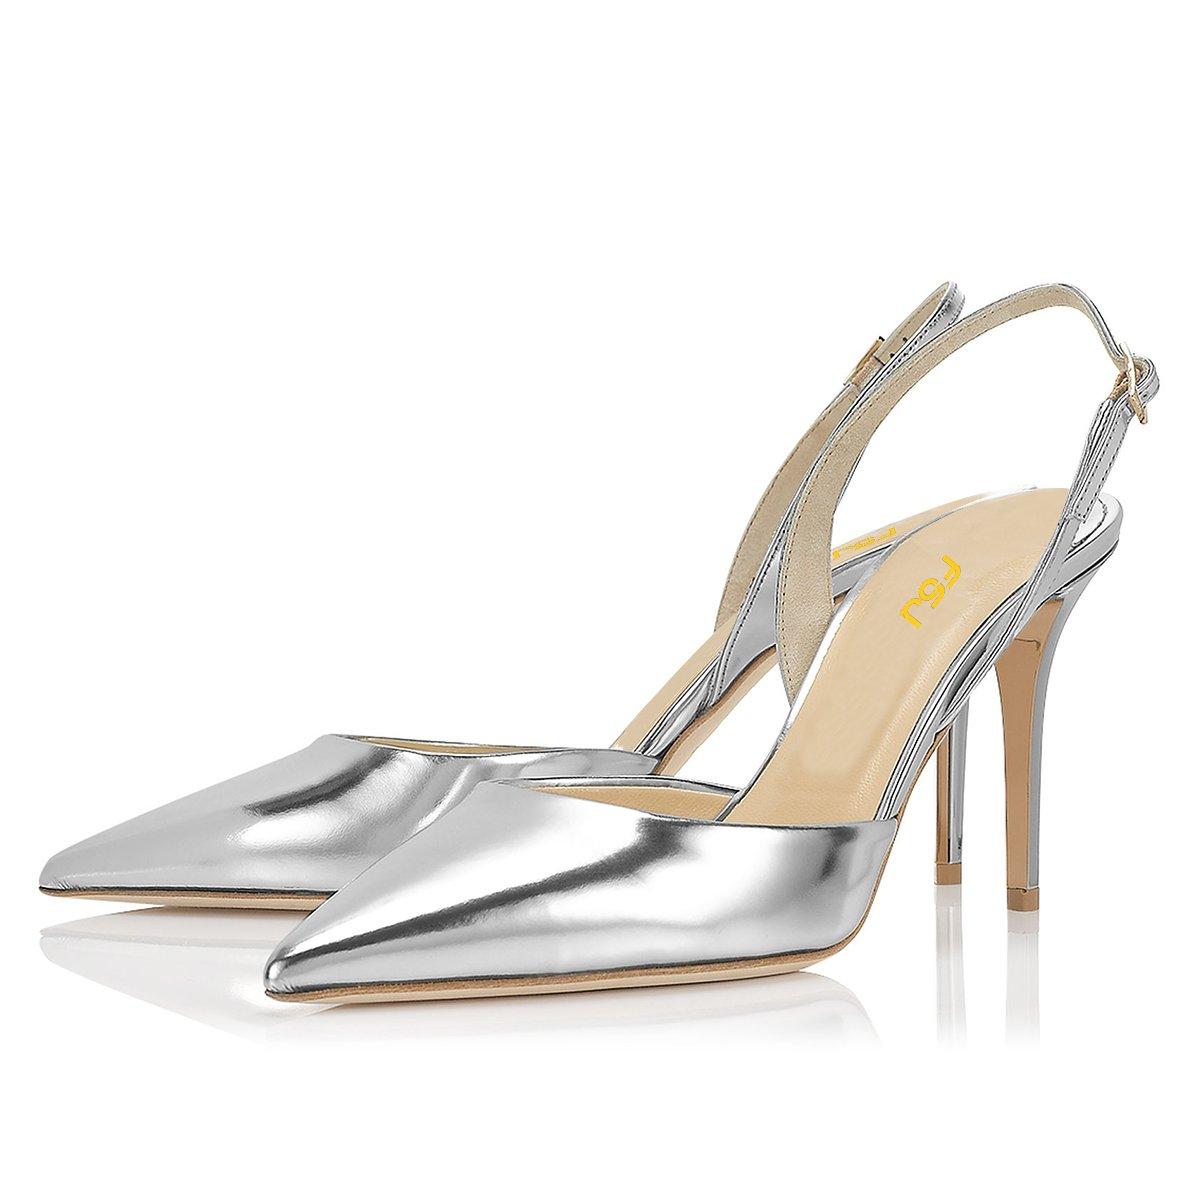 FSJ Women Pointed Toe Pumps Slingback Stilettos Heels Sandals Ankle Strap Shoes Size 7 Silver